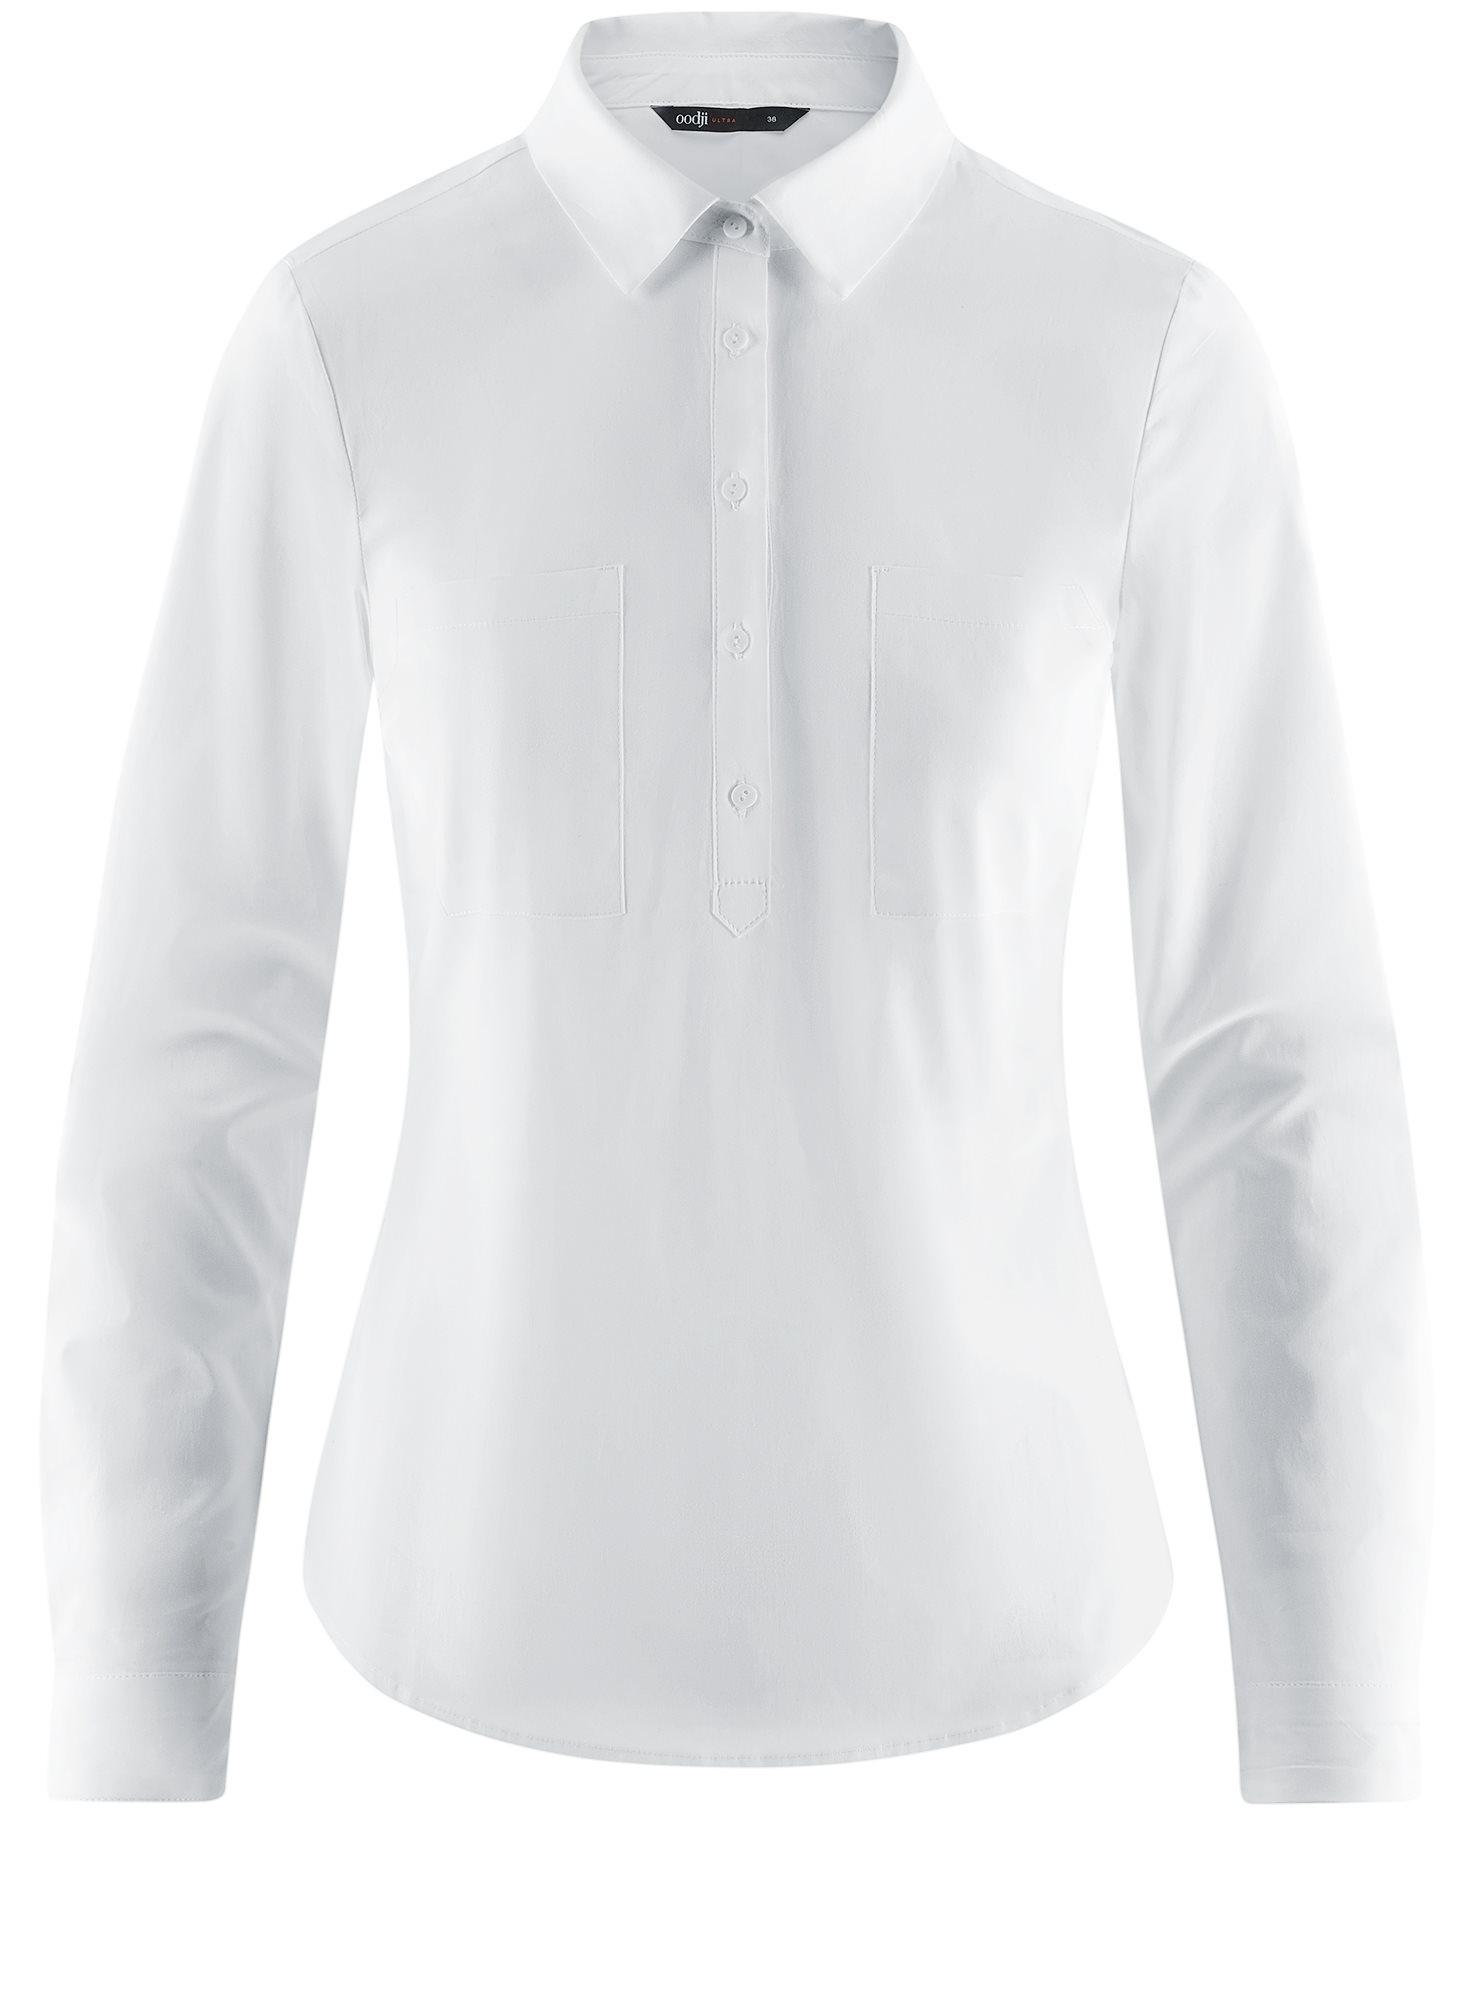 Рубашка базовая с нагрудными карманами oodji для женщины (белый), 11403222B/42468/1000N